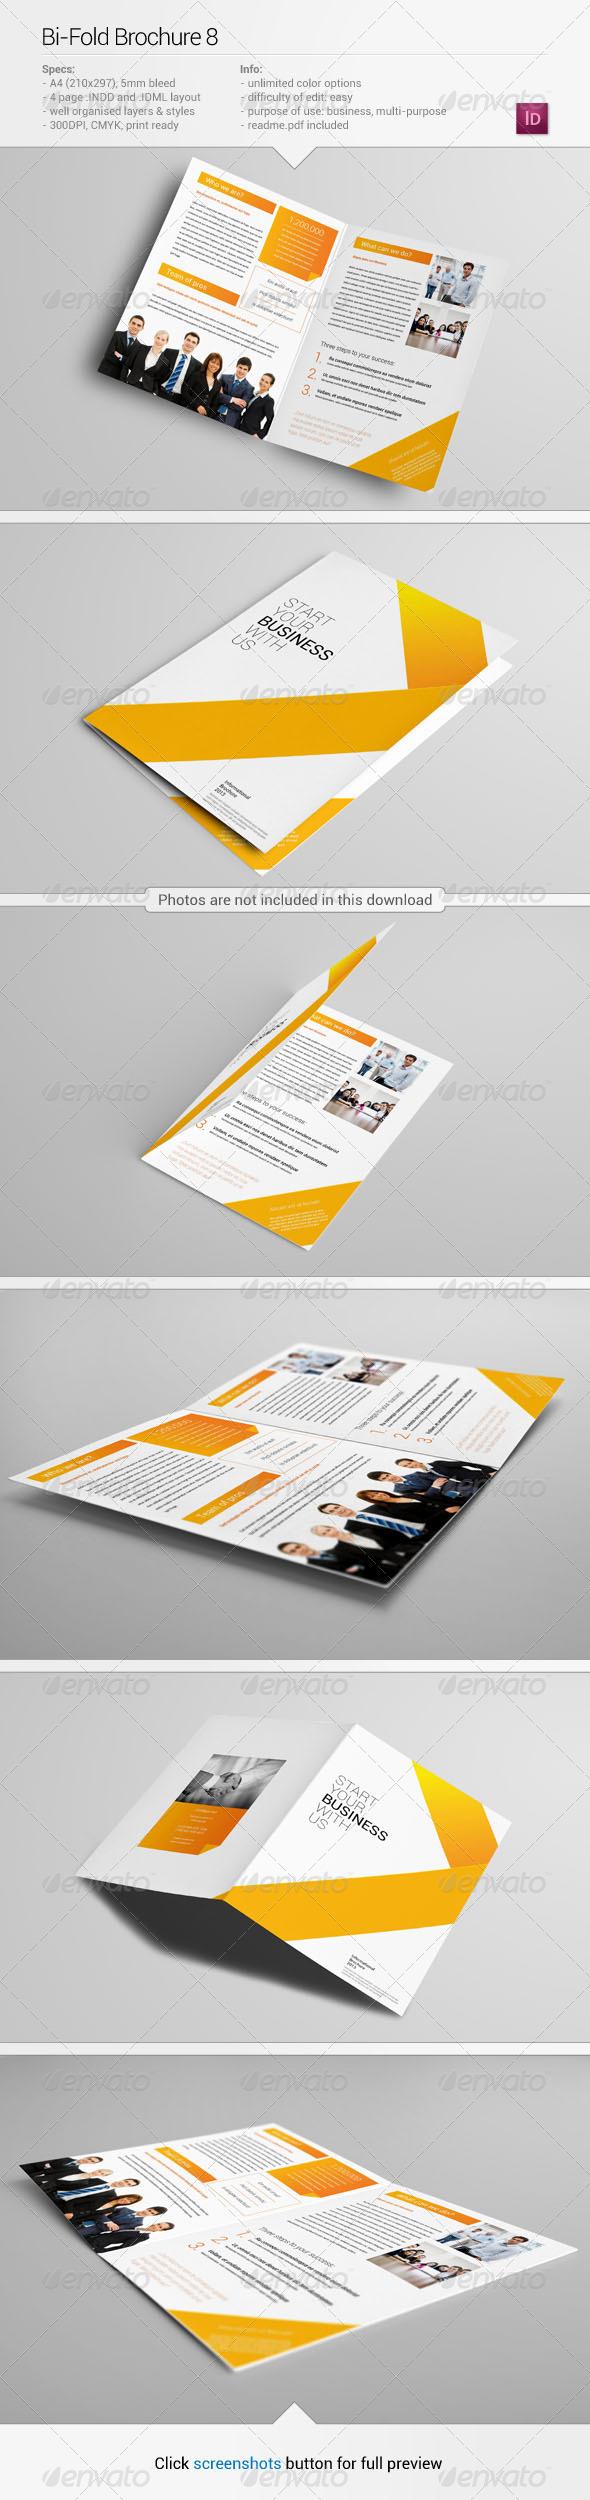 GraphicRiver Bi-Fold Brochure 8 5441783